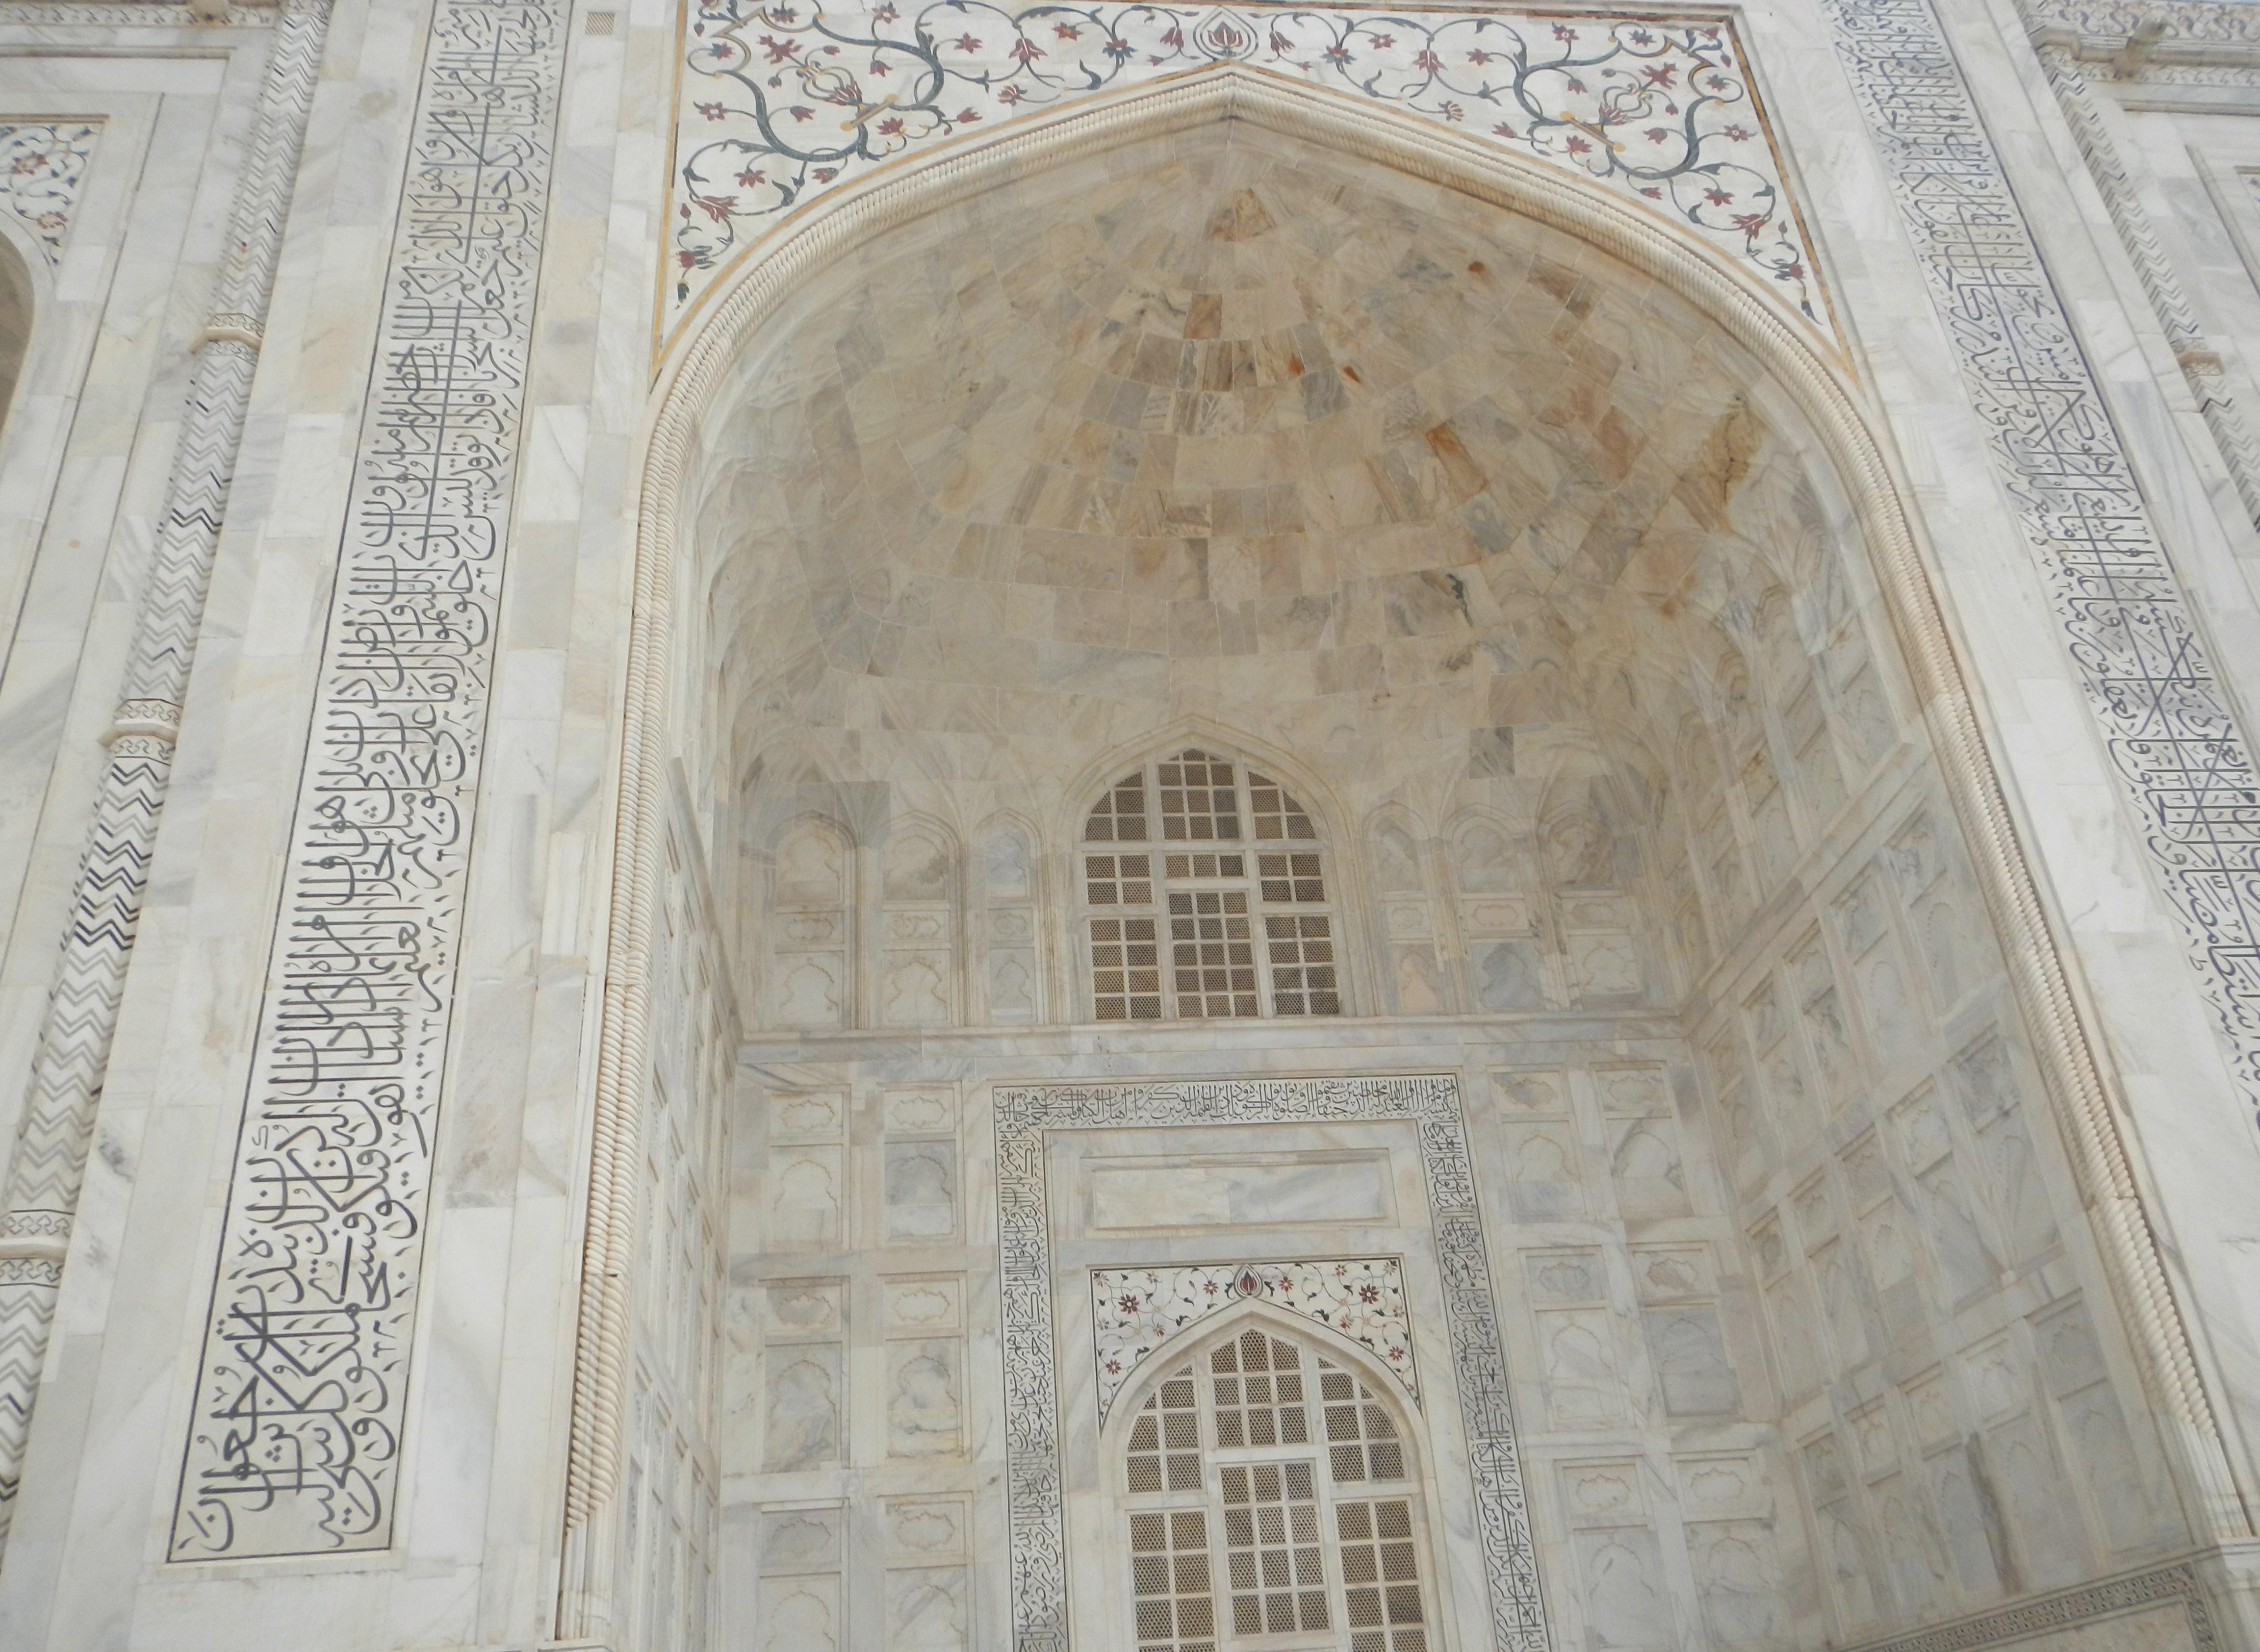 File:Design In The Wall Of Taj Mahal.JPG